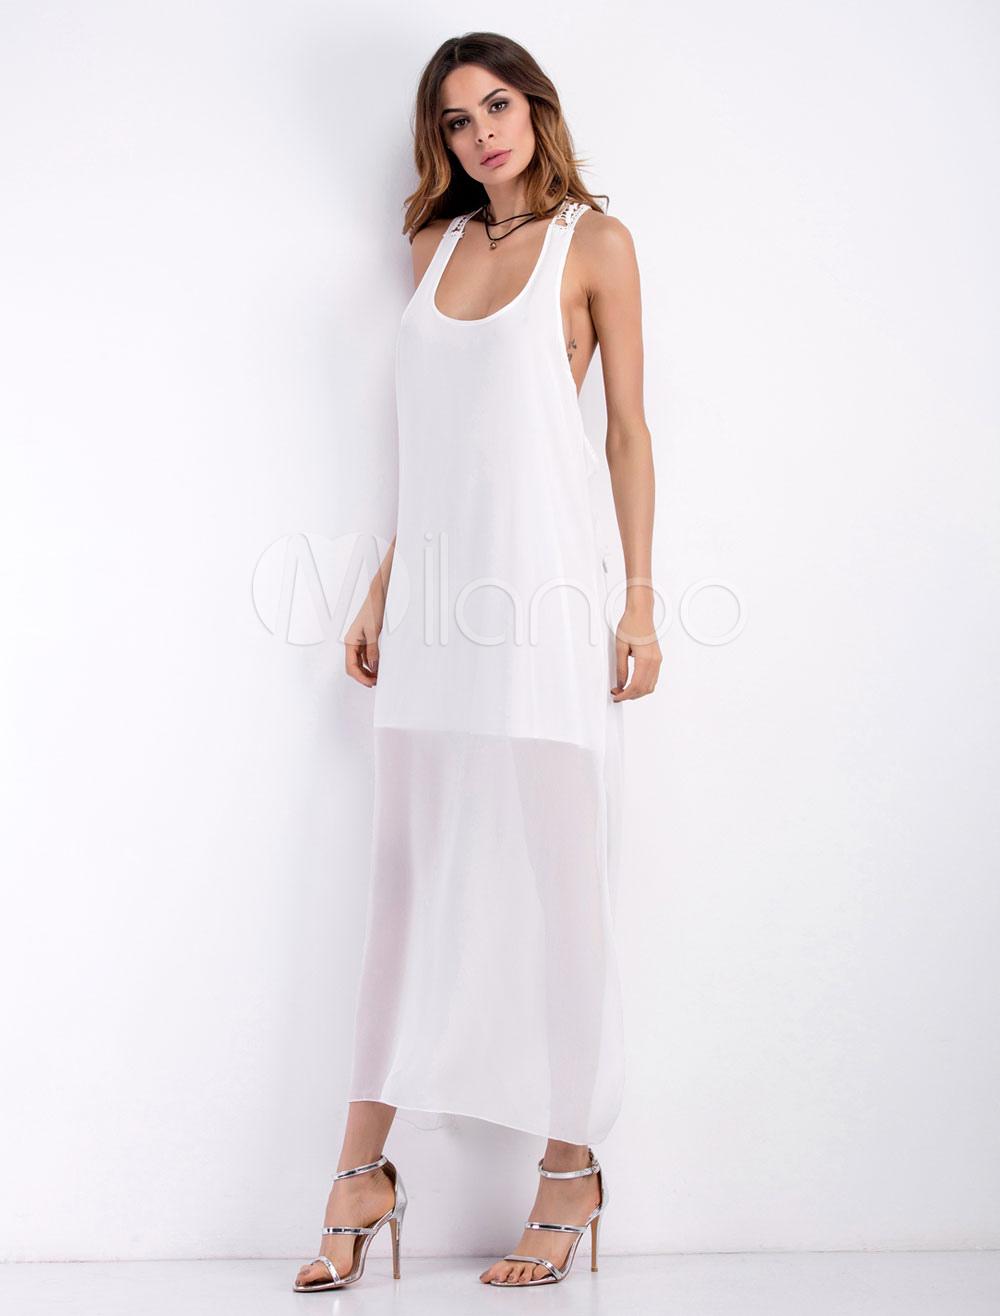 White Maxi Dress Chiffon U Neck Sleeveless Backless Semi-Sheer Long Dress For Women (Women\\'s Clothing Maxi Dresses) photo